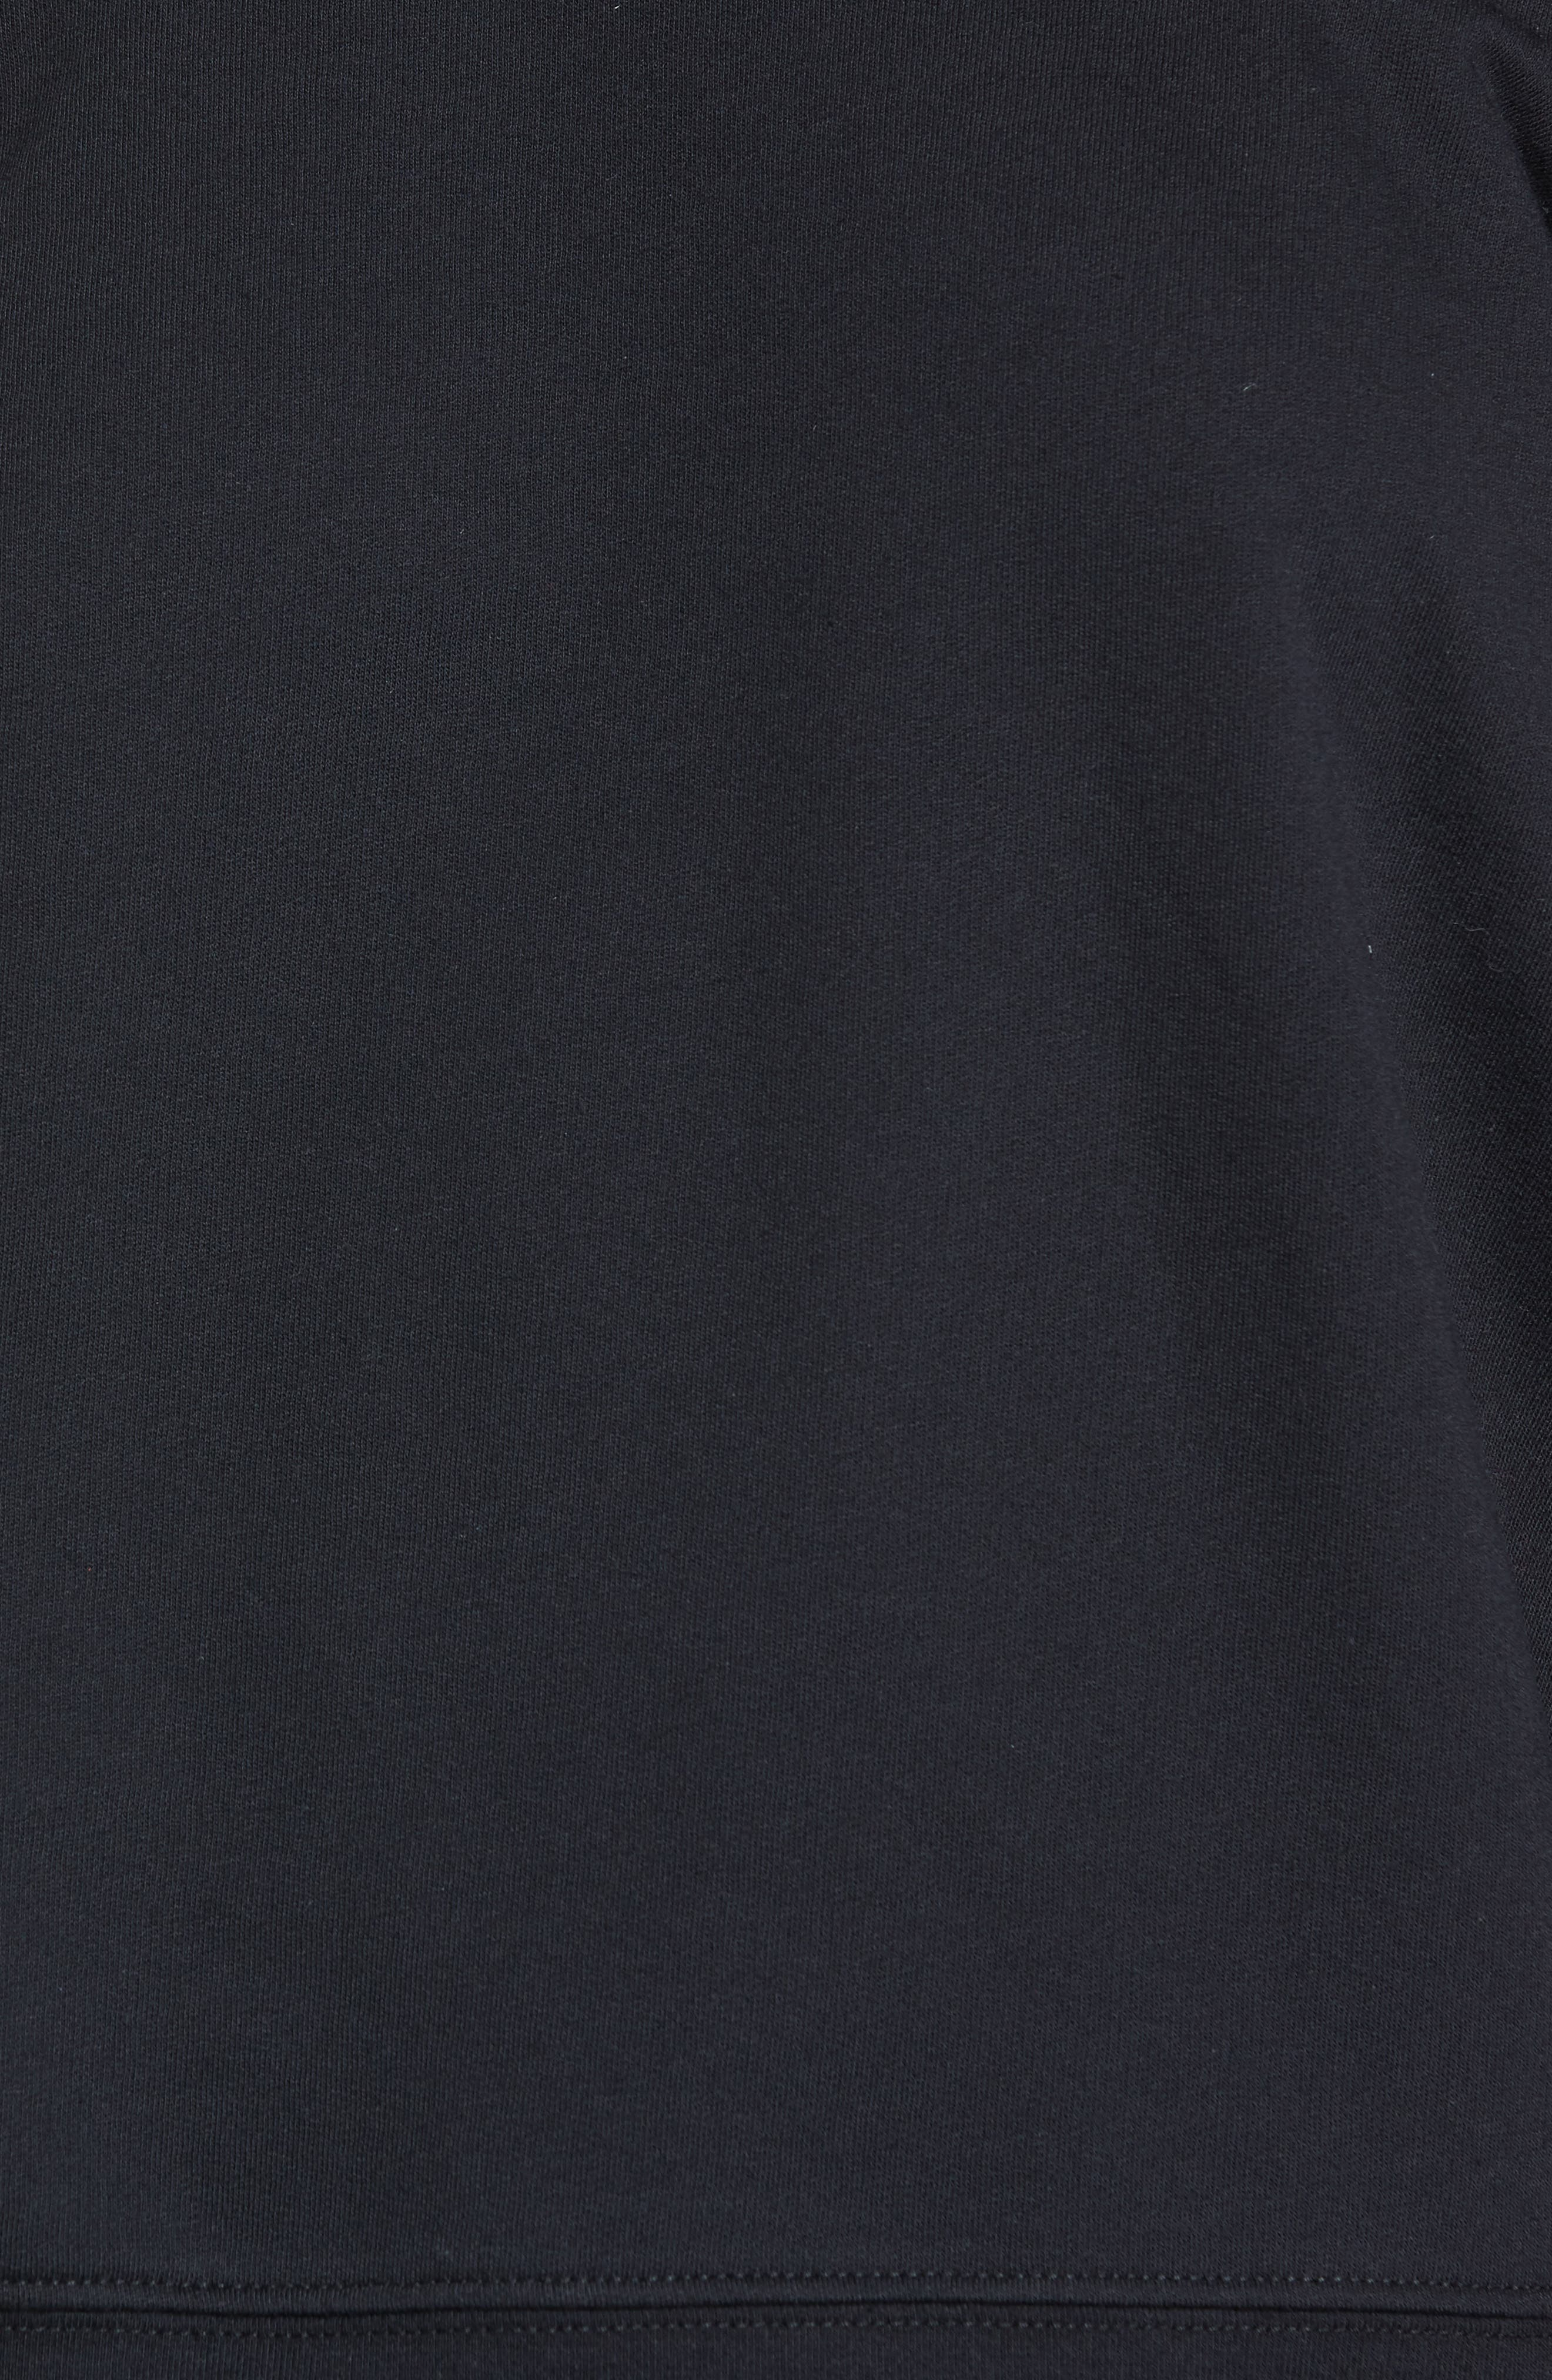 Raw Neck Sweatshirt,                             Alternate thumbnail 5, color,                             001